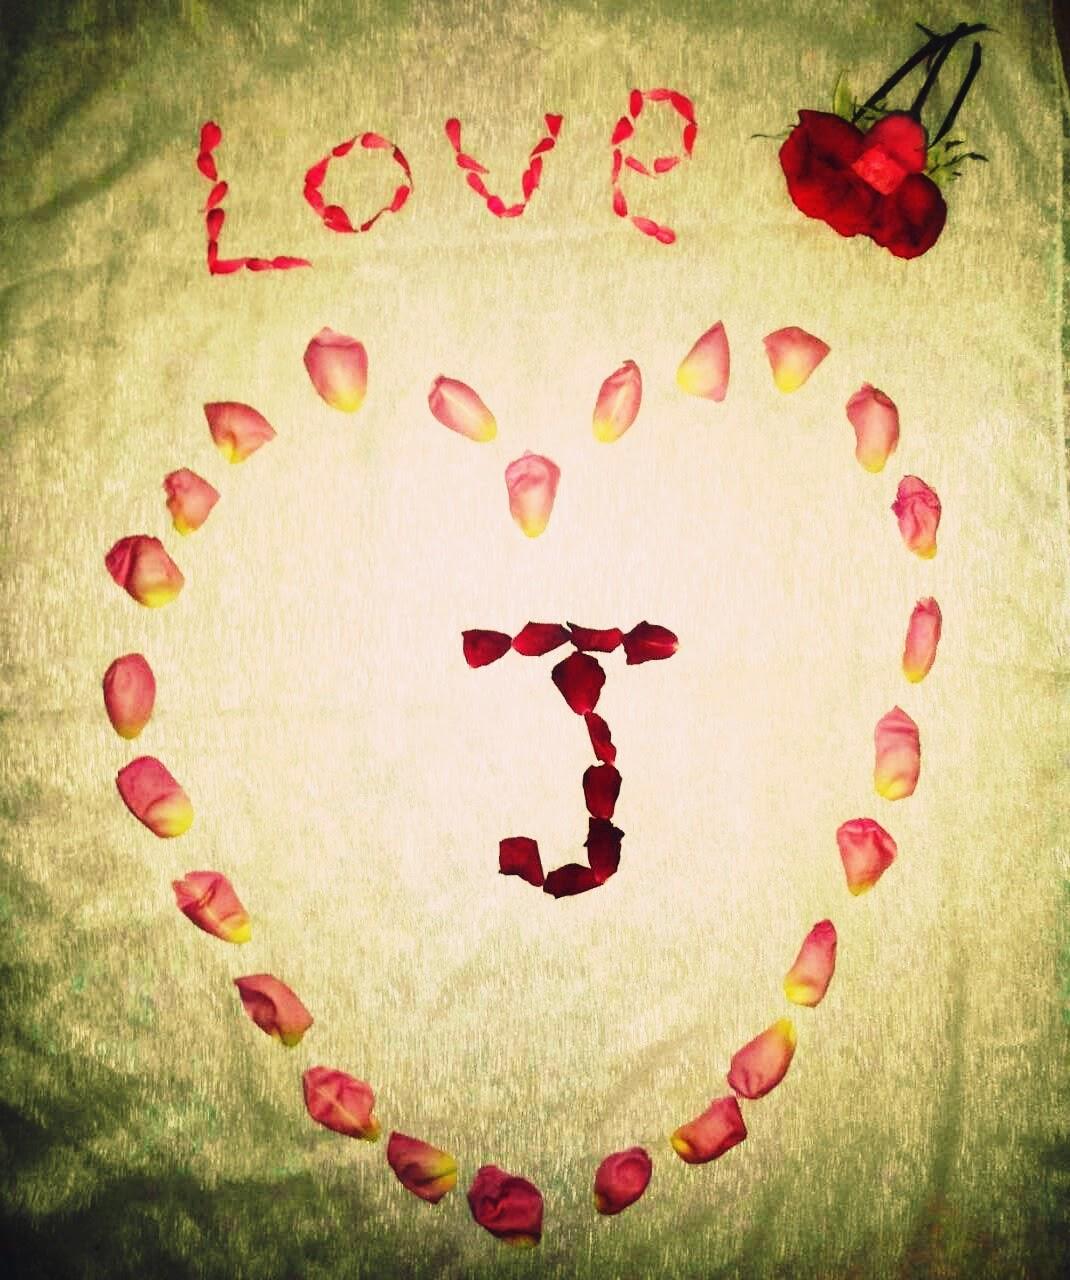 صورة صور حرف j , تفاصيل مميزه عن حرف j